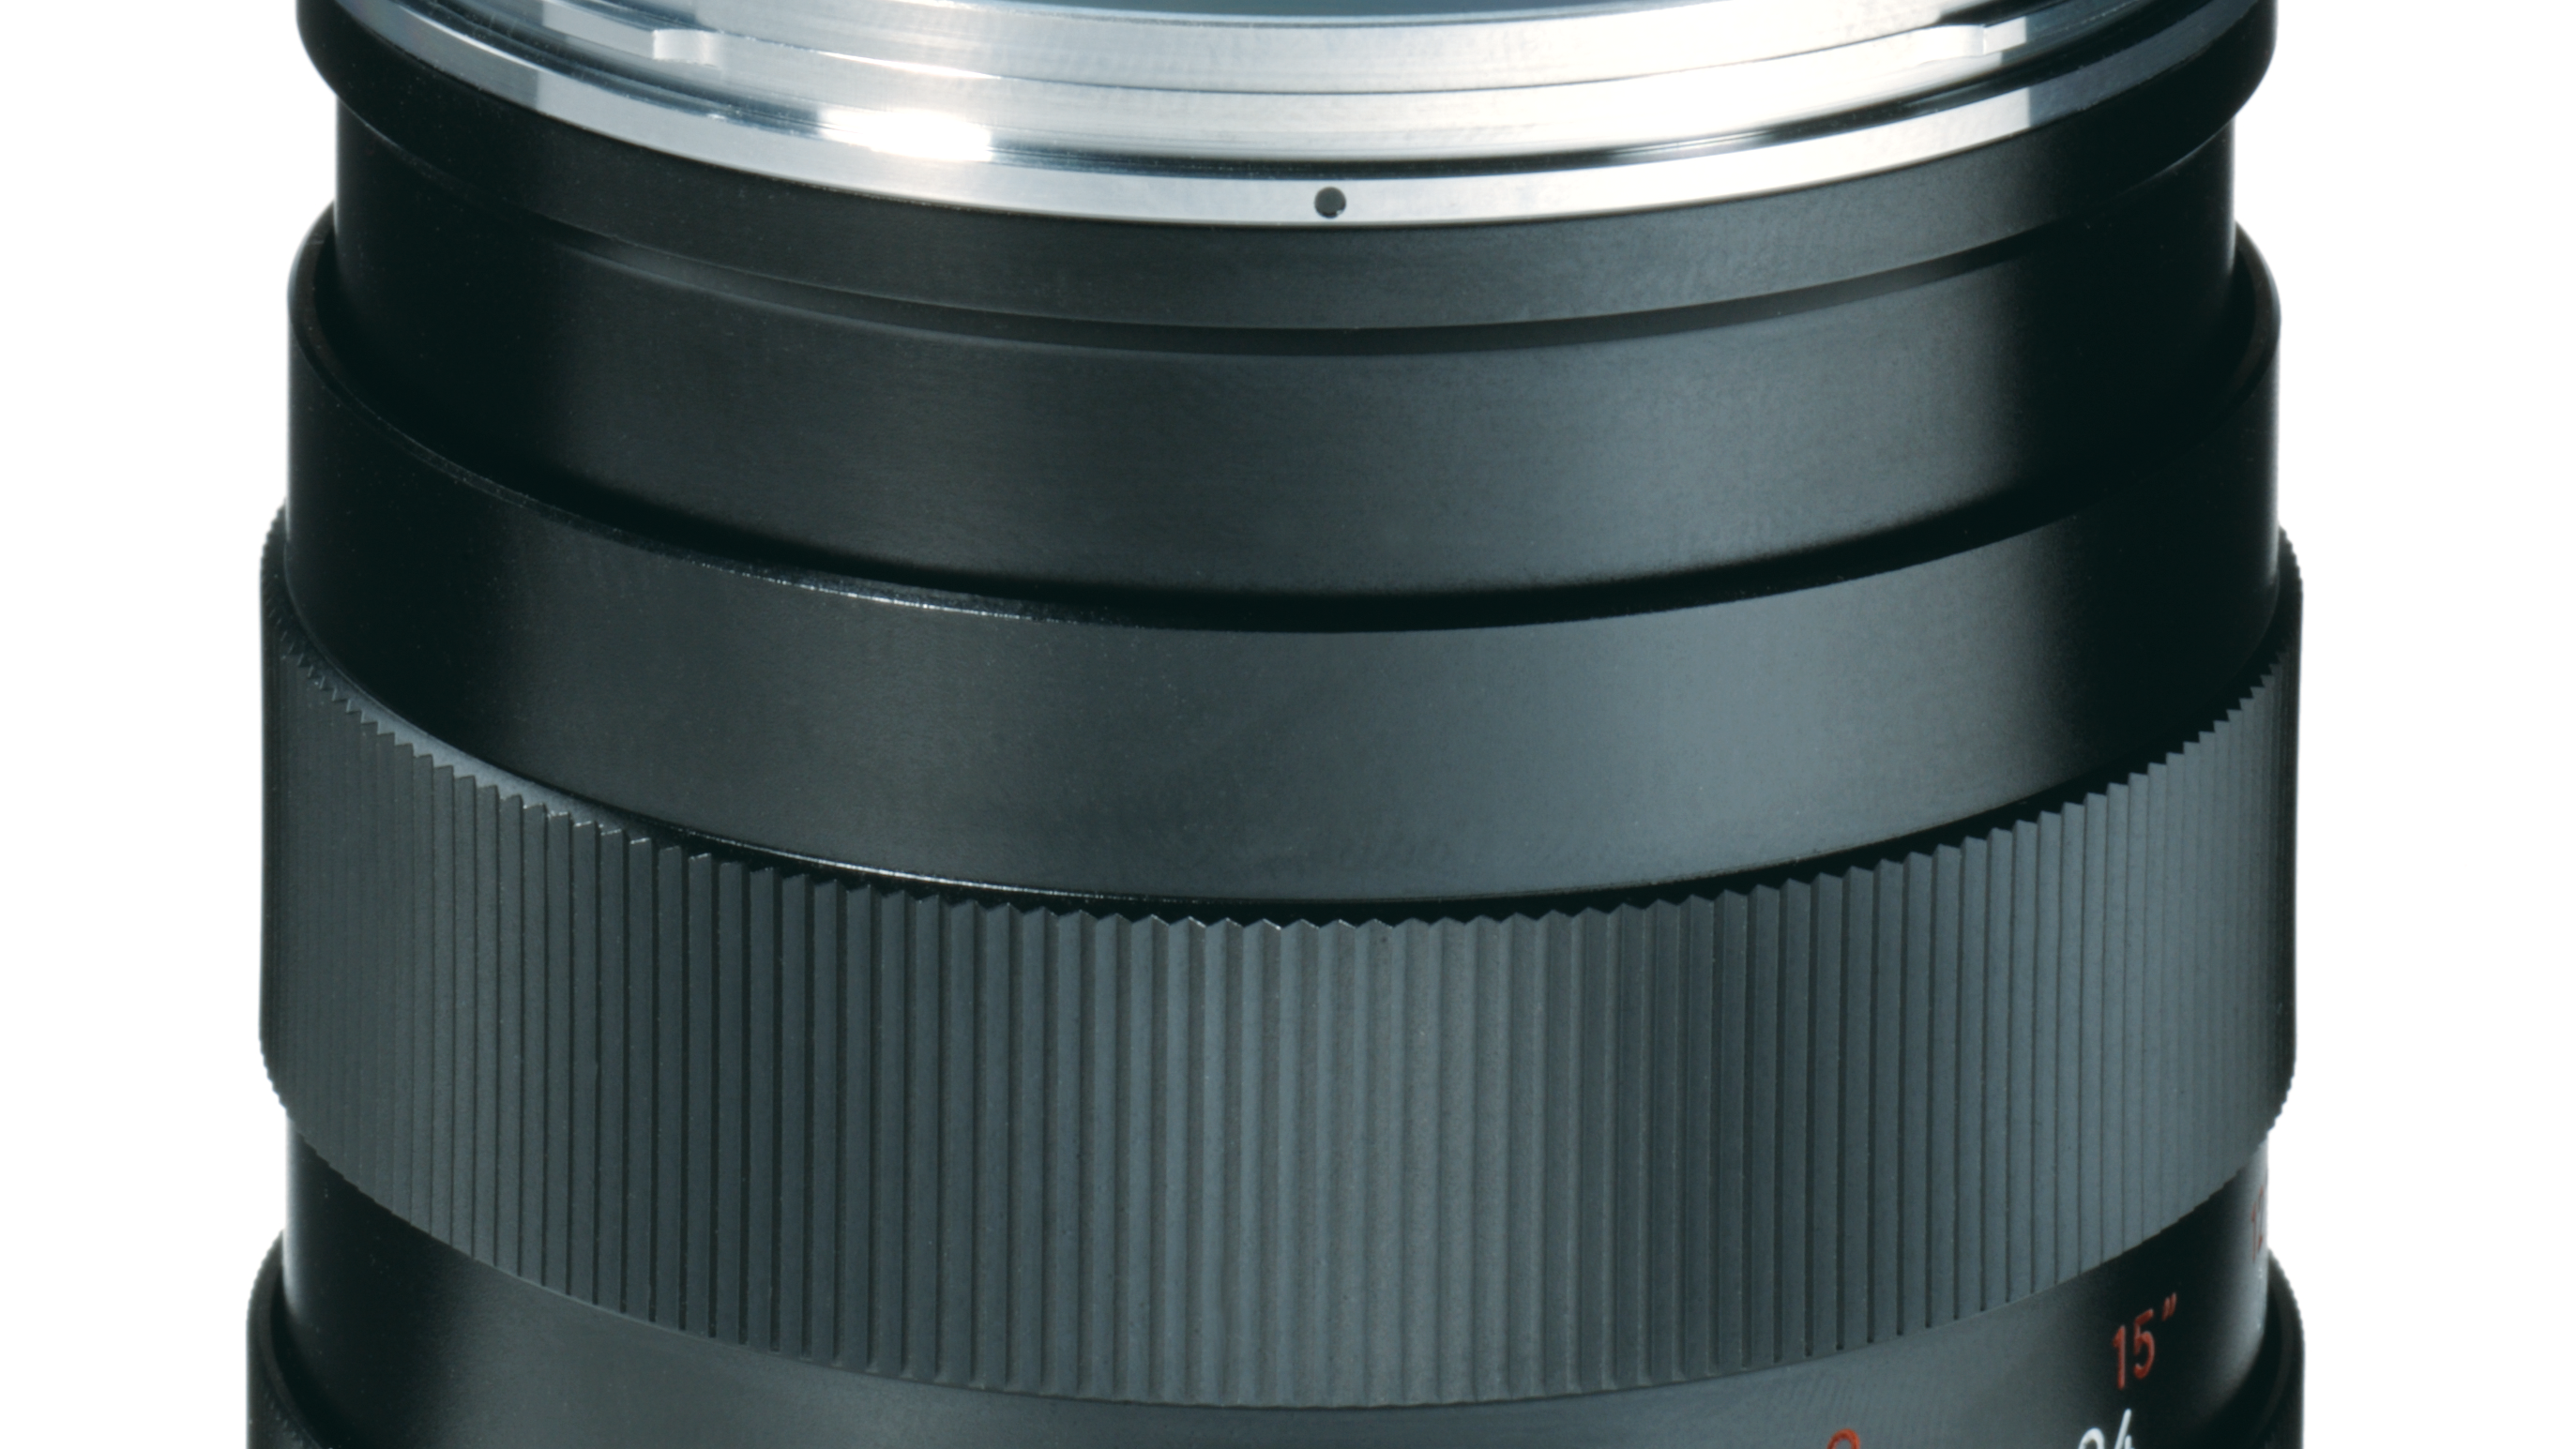 Carl Zeiss 28mm f2.0 for Nikon og Pentax